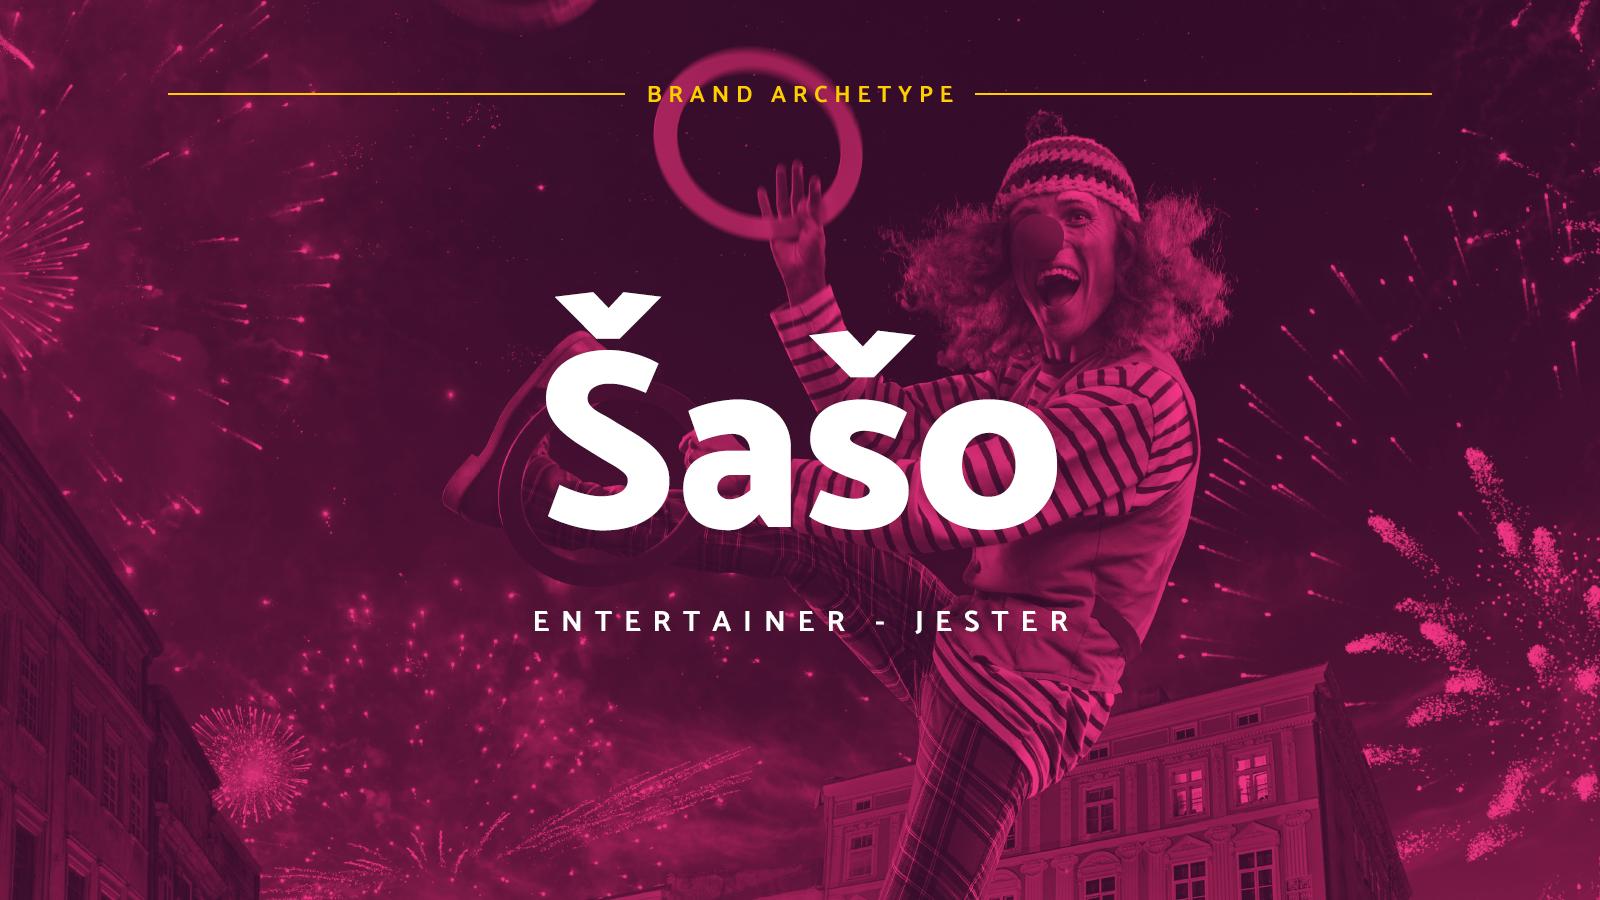 Brand archetypy: Šašo (Entertainer - Jester)